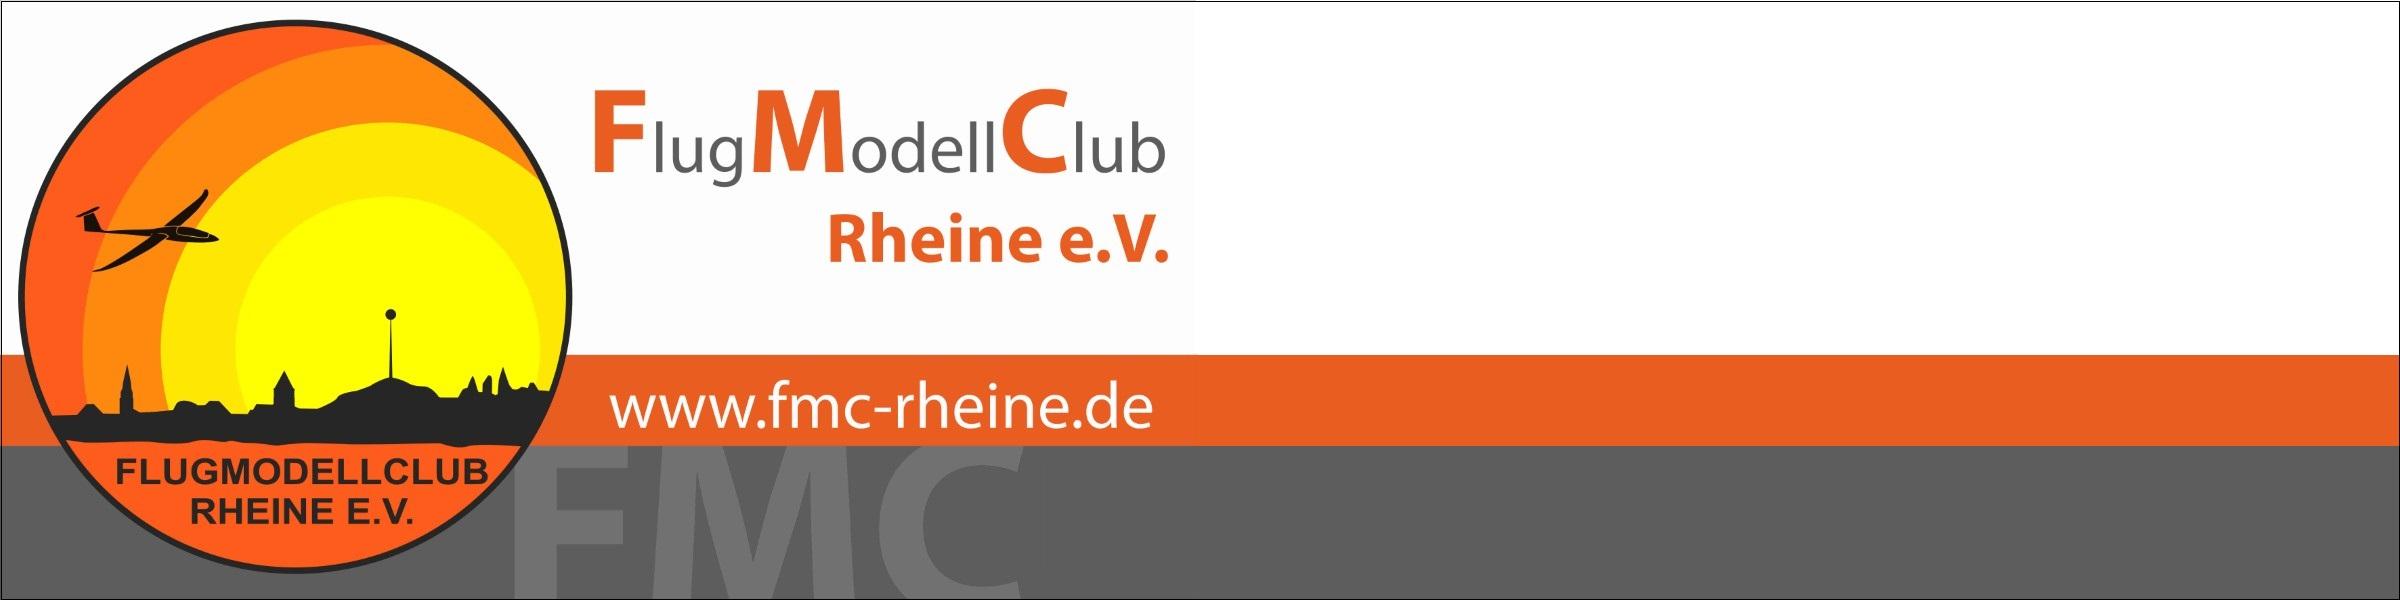 Flugmodellclub Rheine e. V.